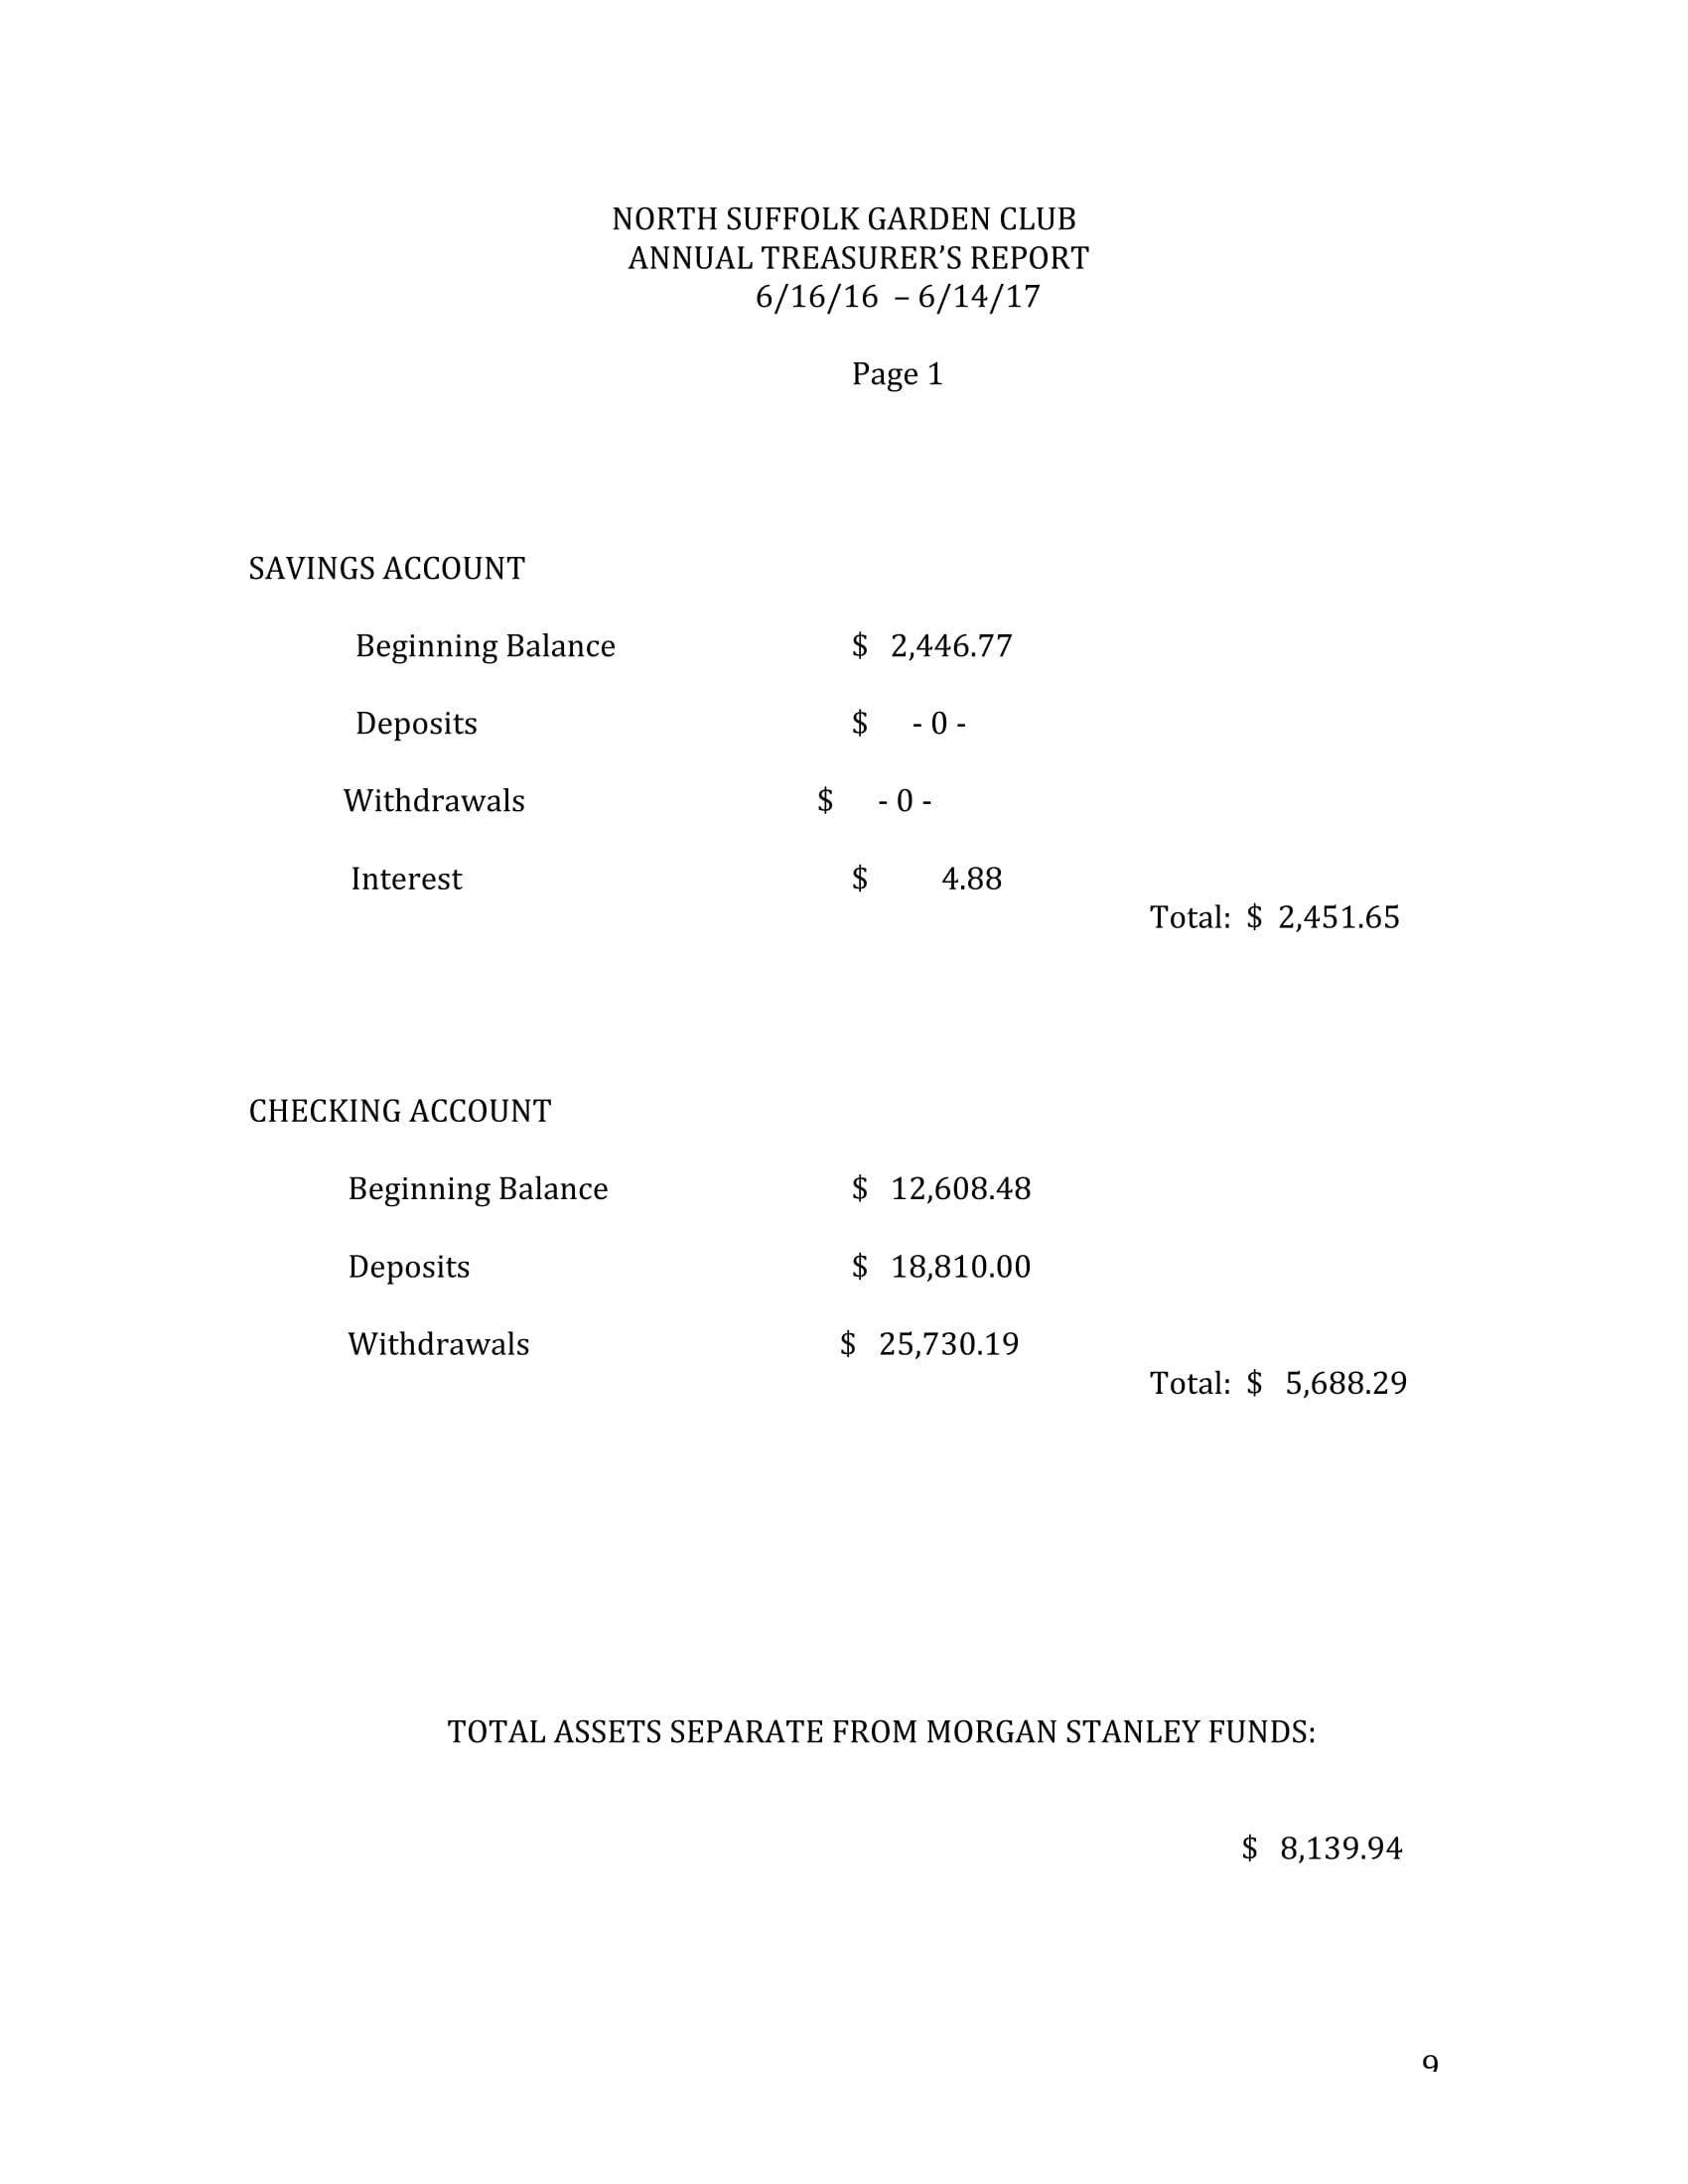 NSGC Annual Report-09.jpg